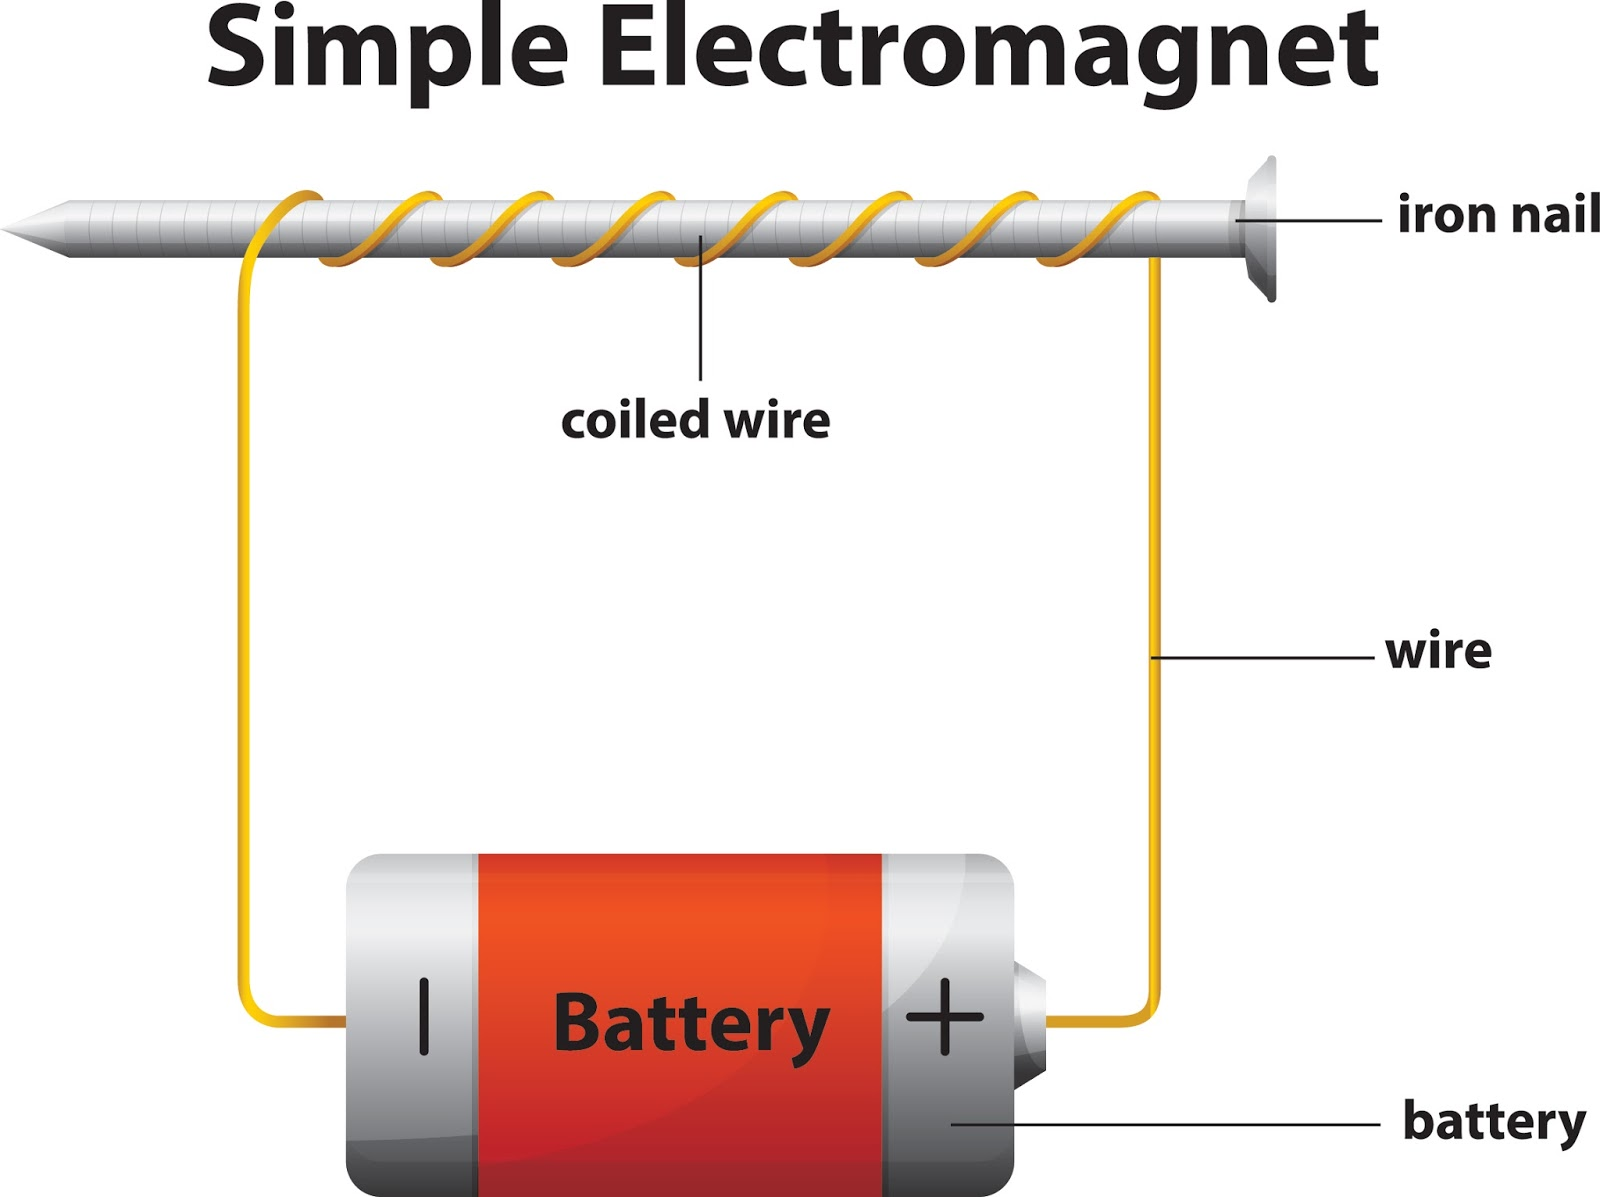 Cara Membuat Medan Elektromagnet Sederhana